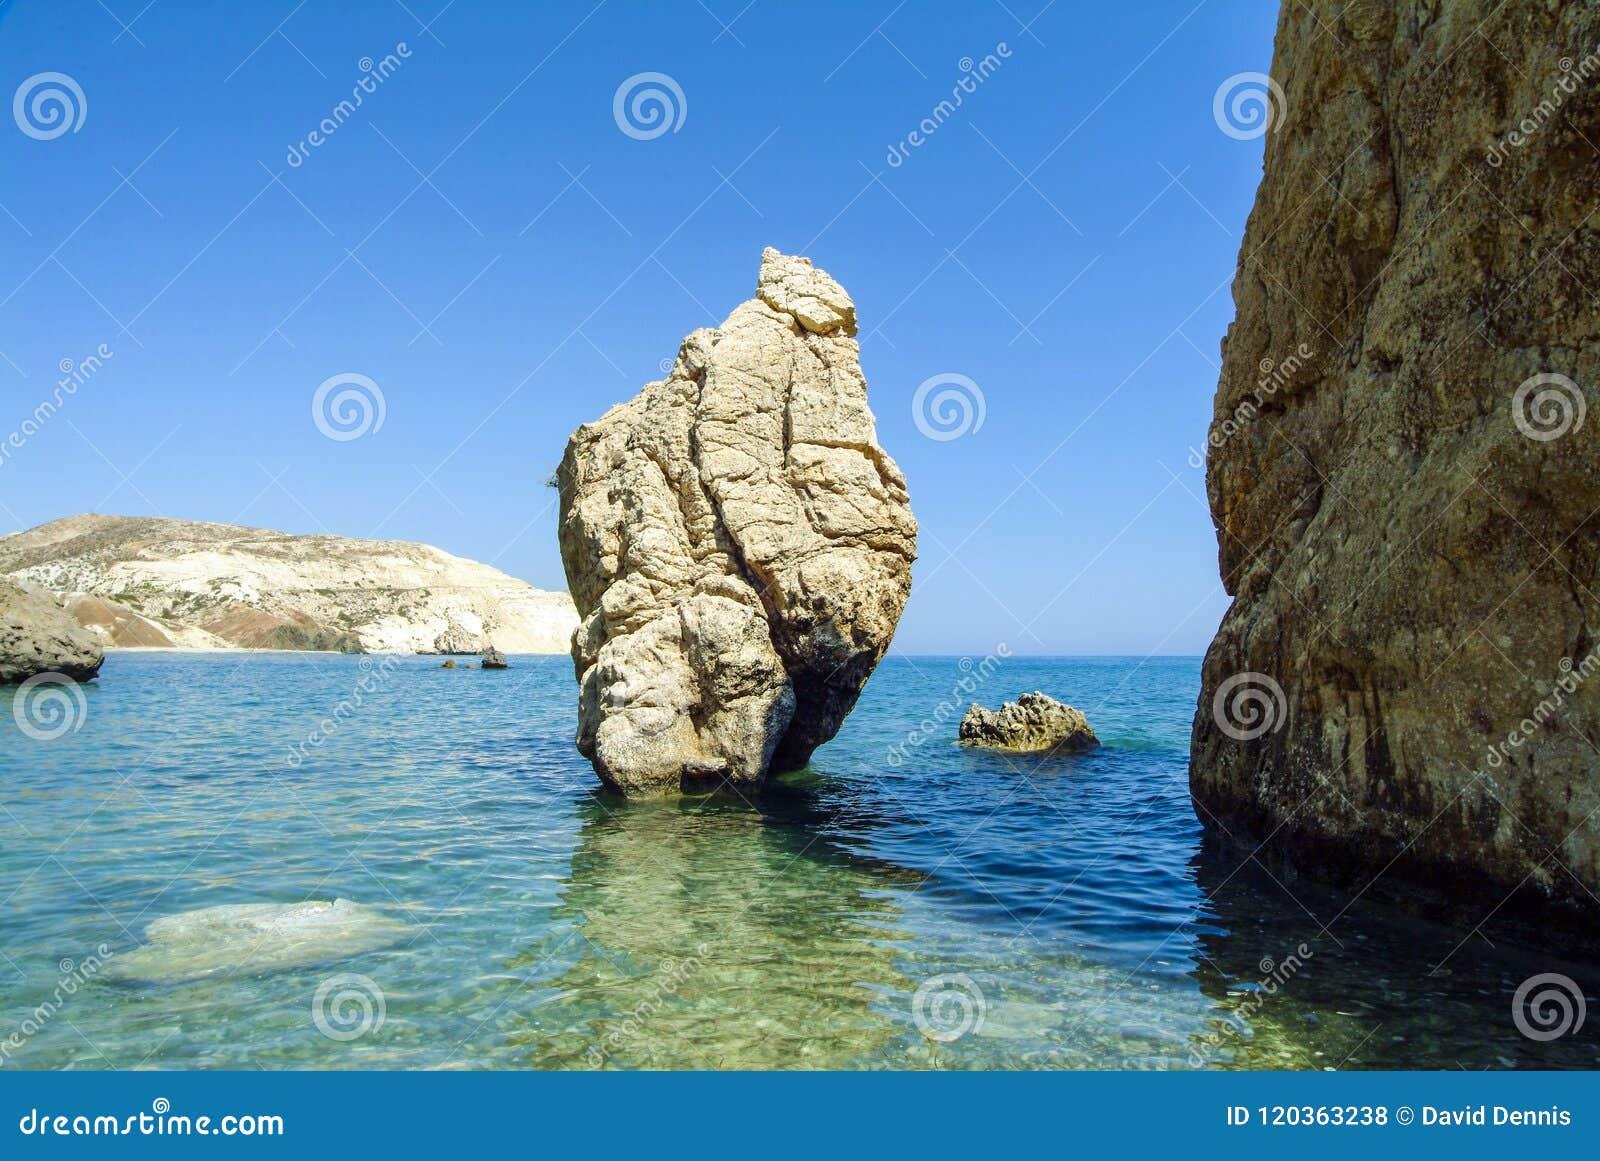 The Rocks of Aphrodite, on the Mediterranean Island of Cyprus